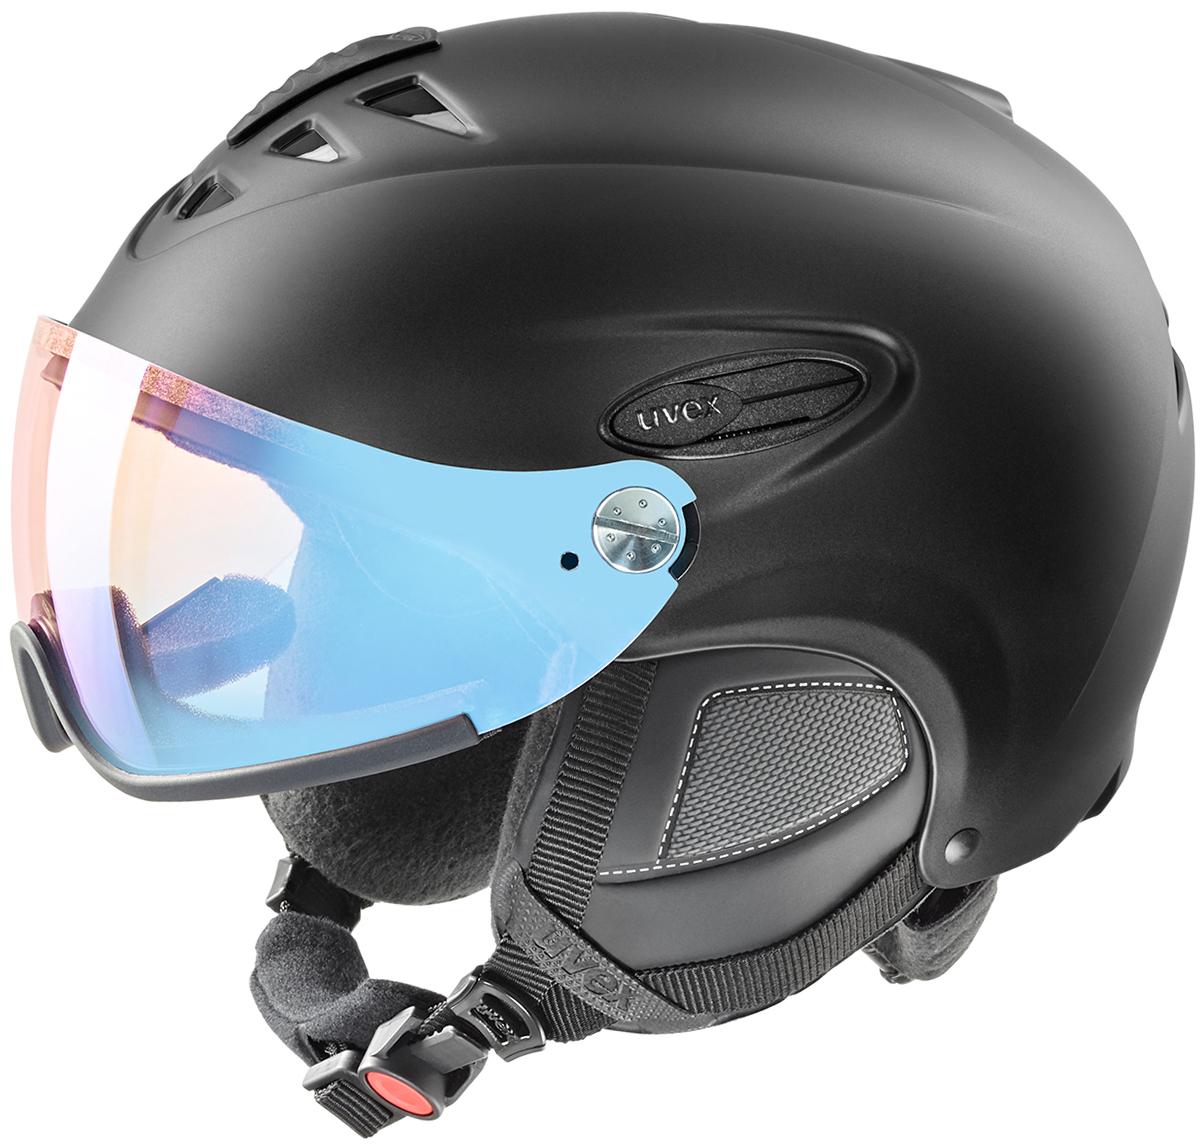 Uvex Шлем Uvex 300 Visor Vario, размер 57-60